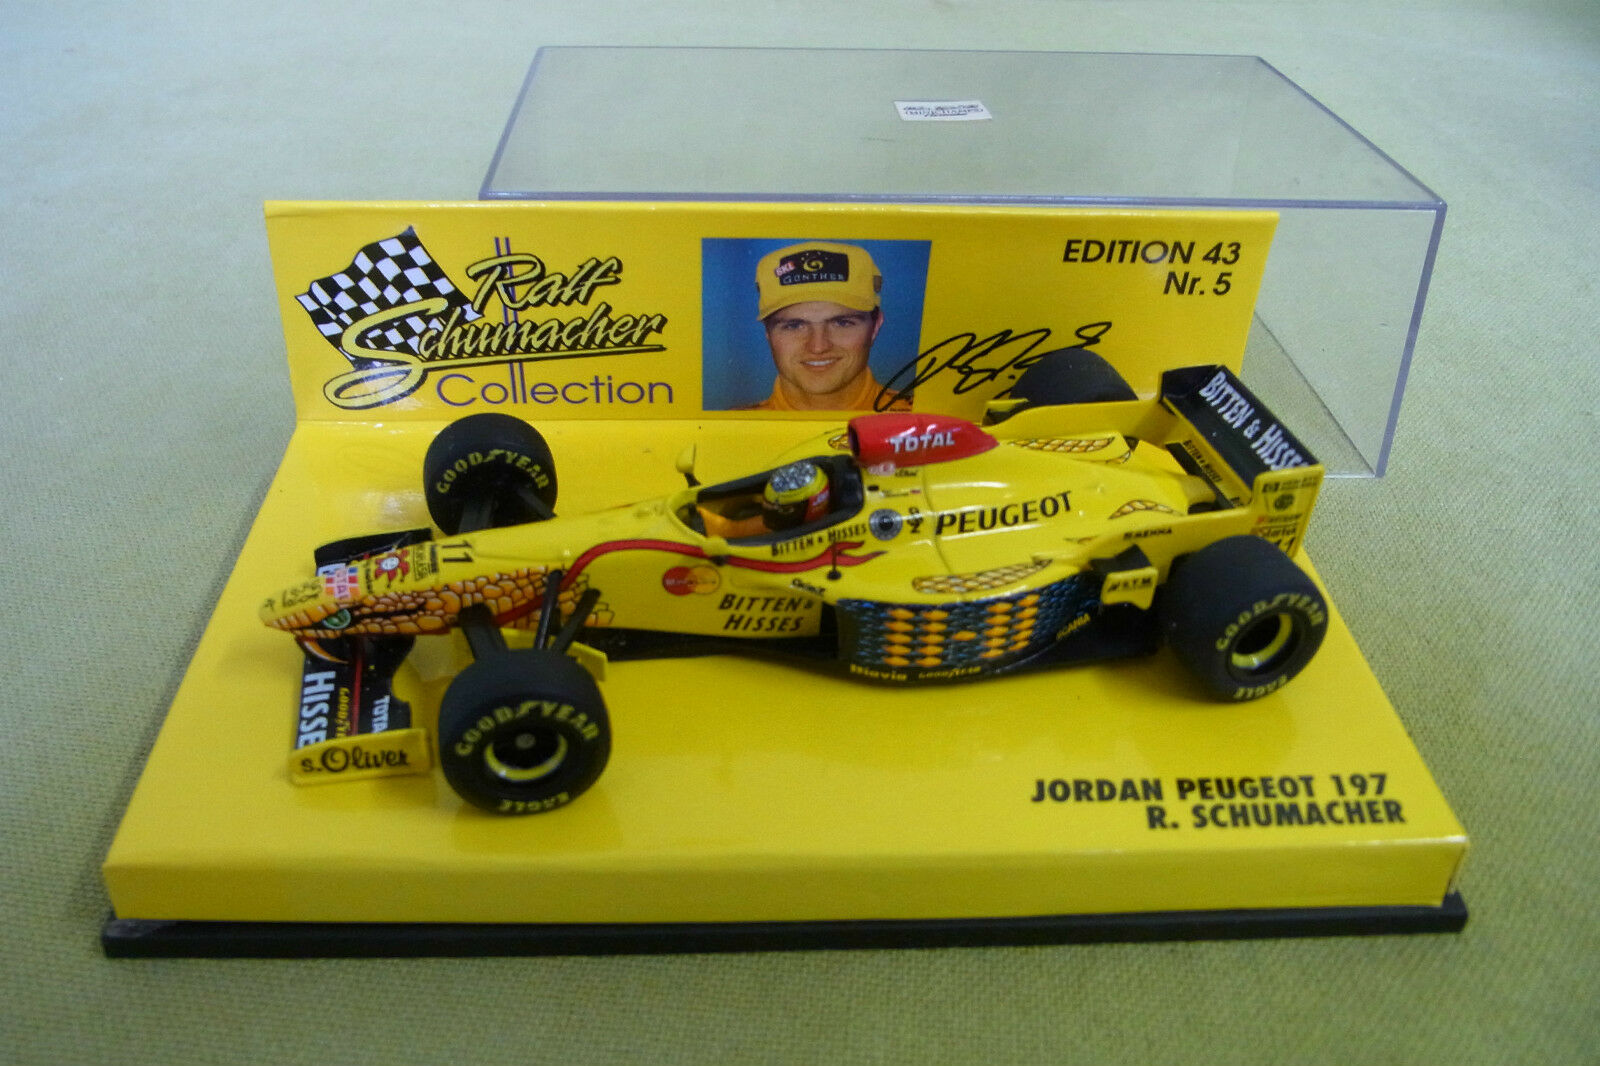 Minichamps - Jordan Peugeot 197 - R. Schumacher - Edition 43 Nr. 5